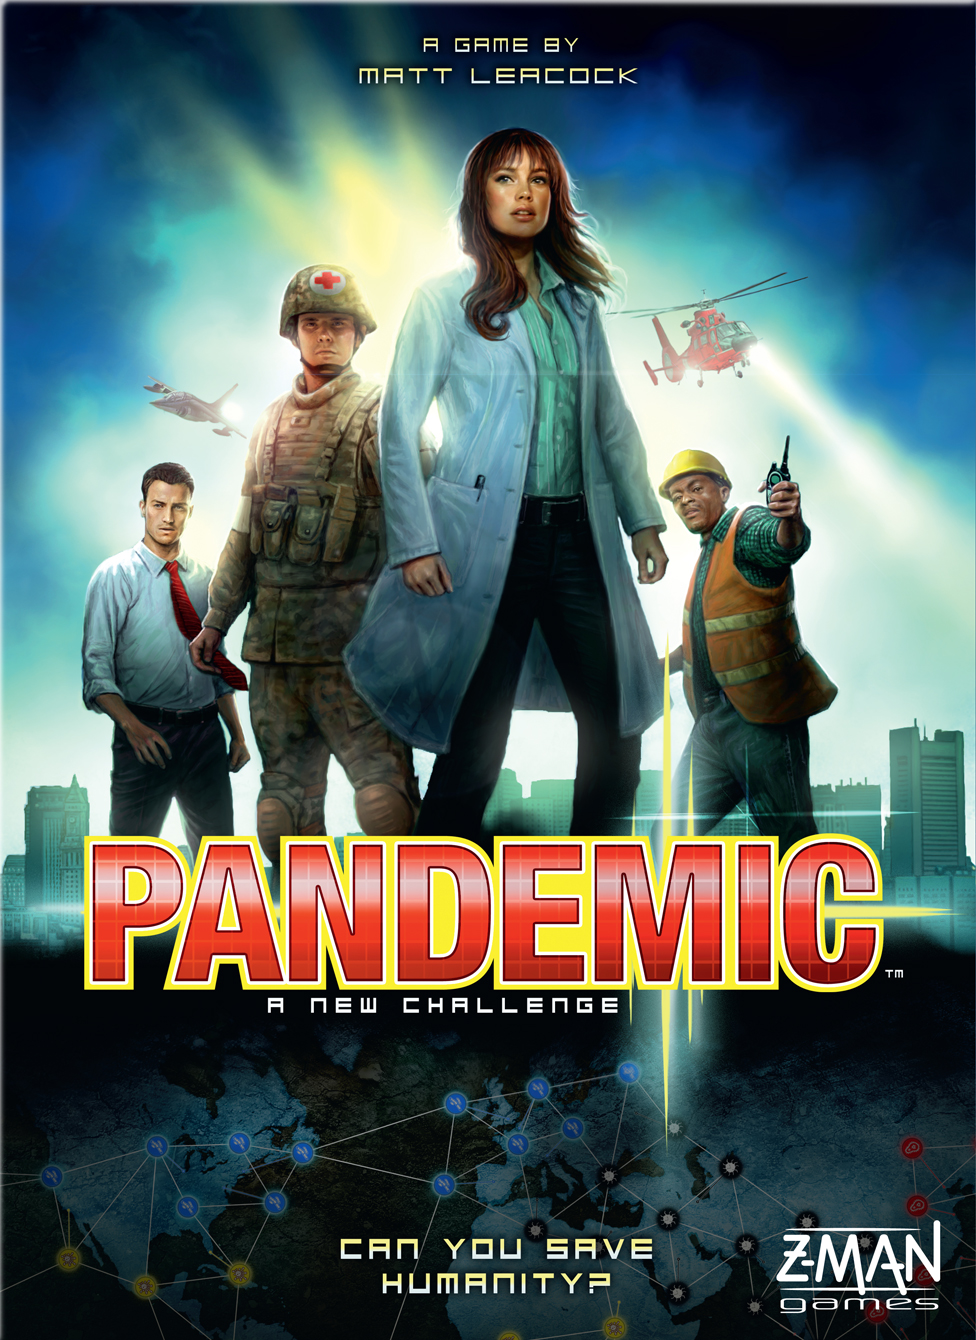 pandemic-2013-box-art-full